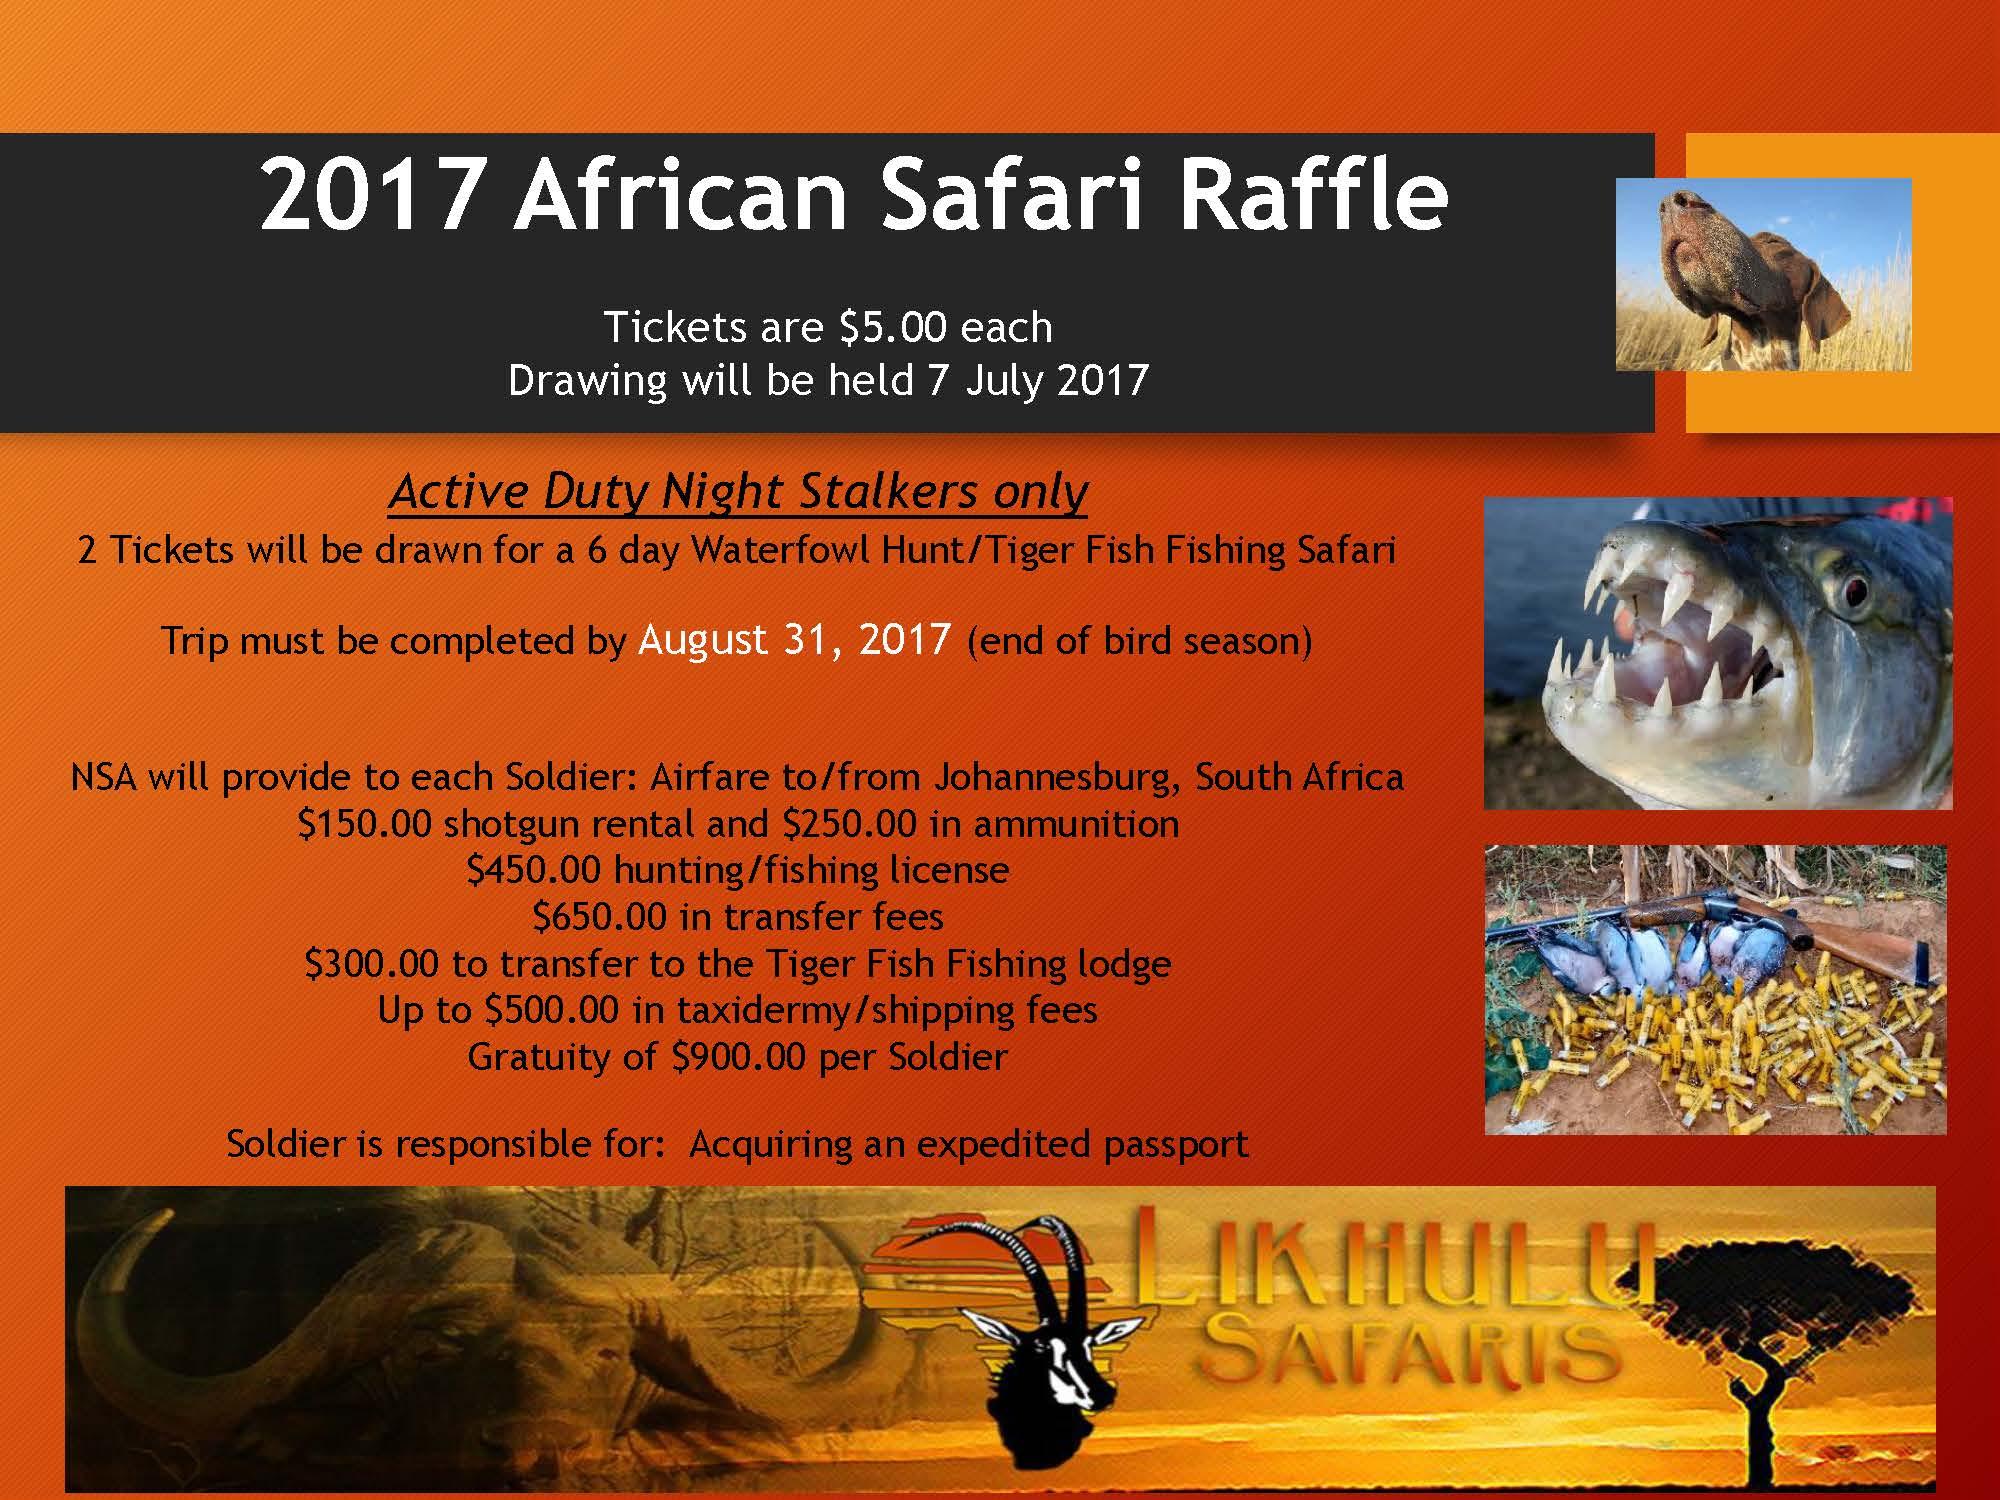 2017 African Safari Raffle